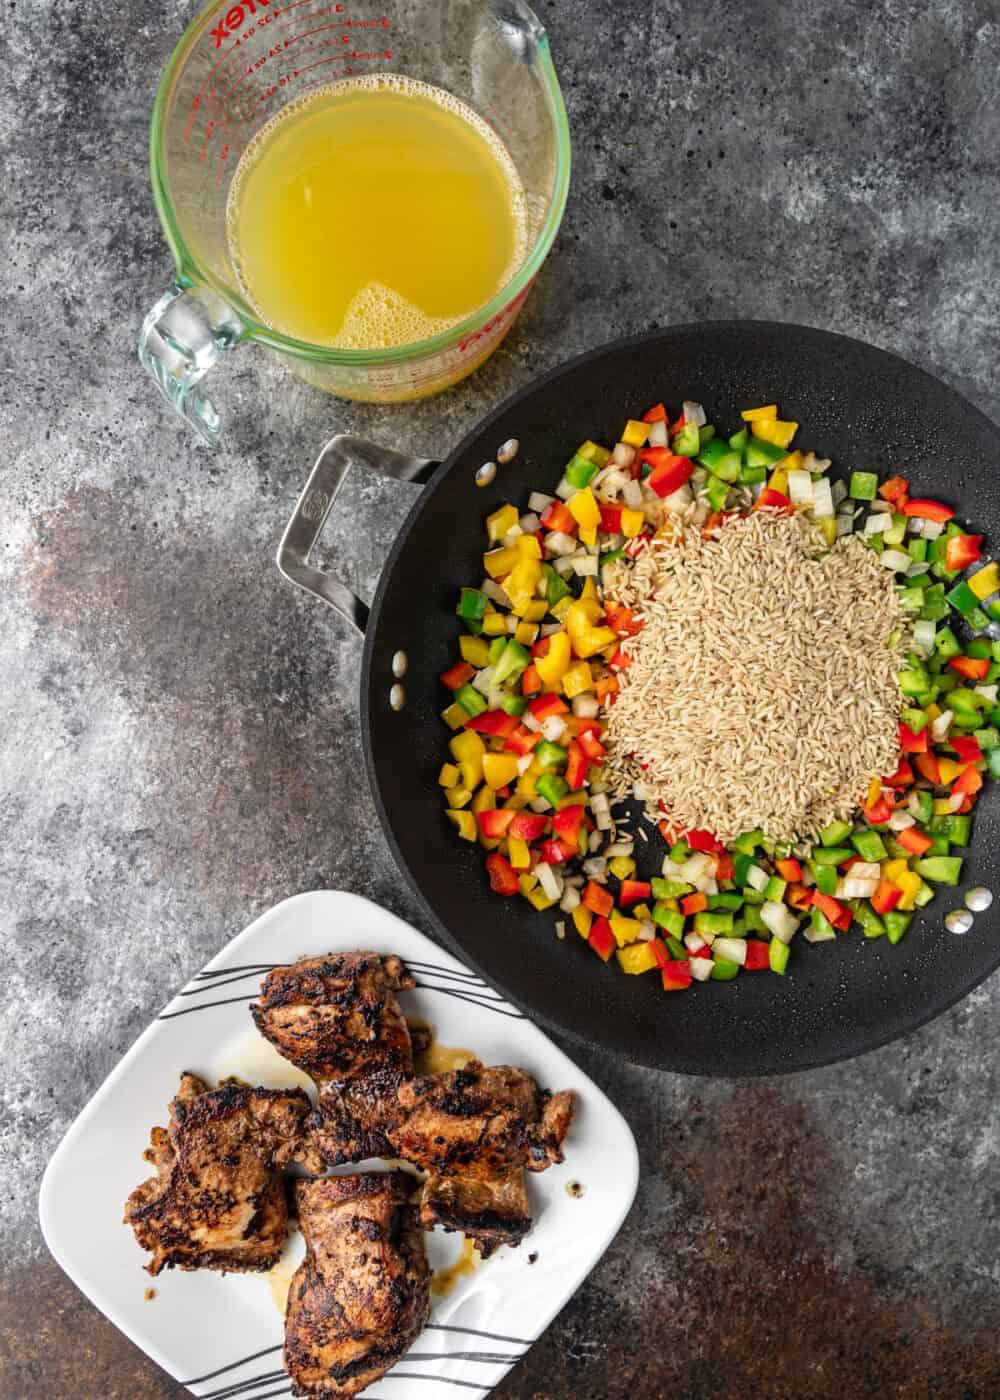 overhead: ingredients to make jerk seasoning and jerk chicken recipe on counter